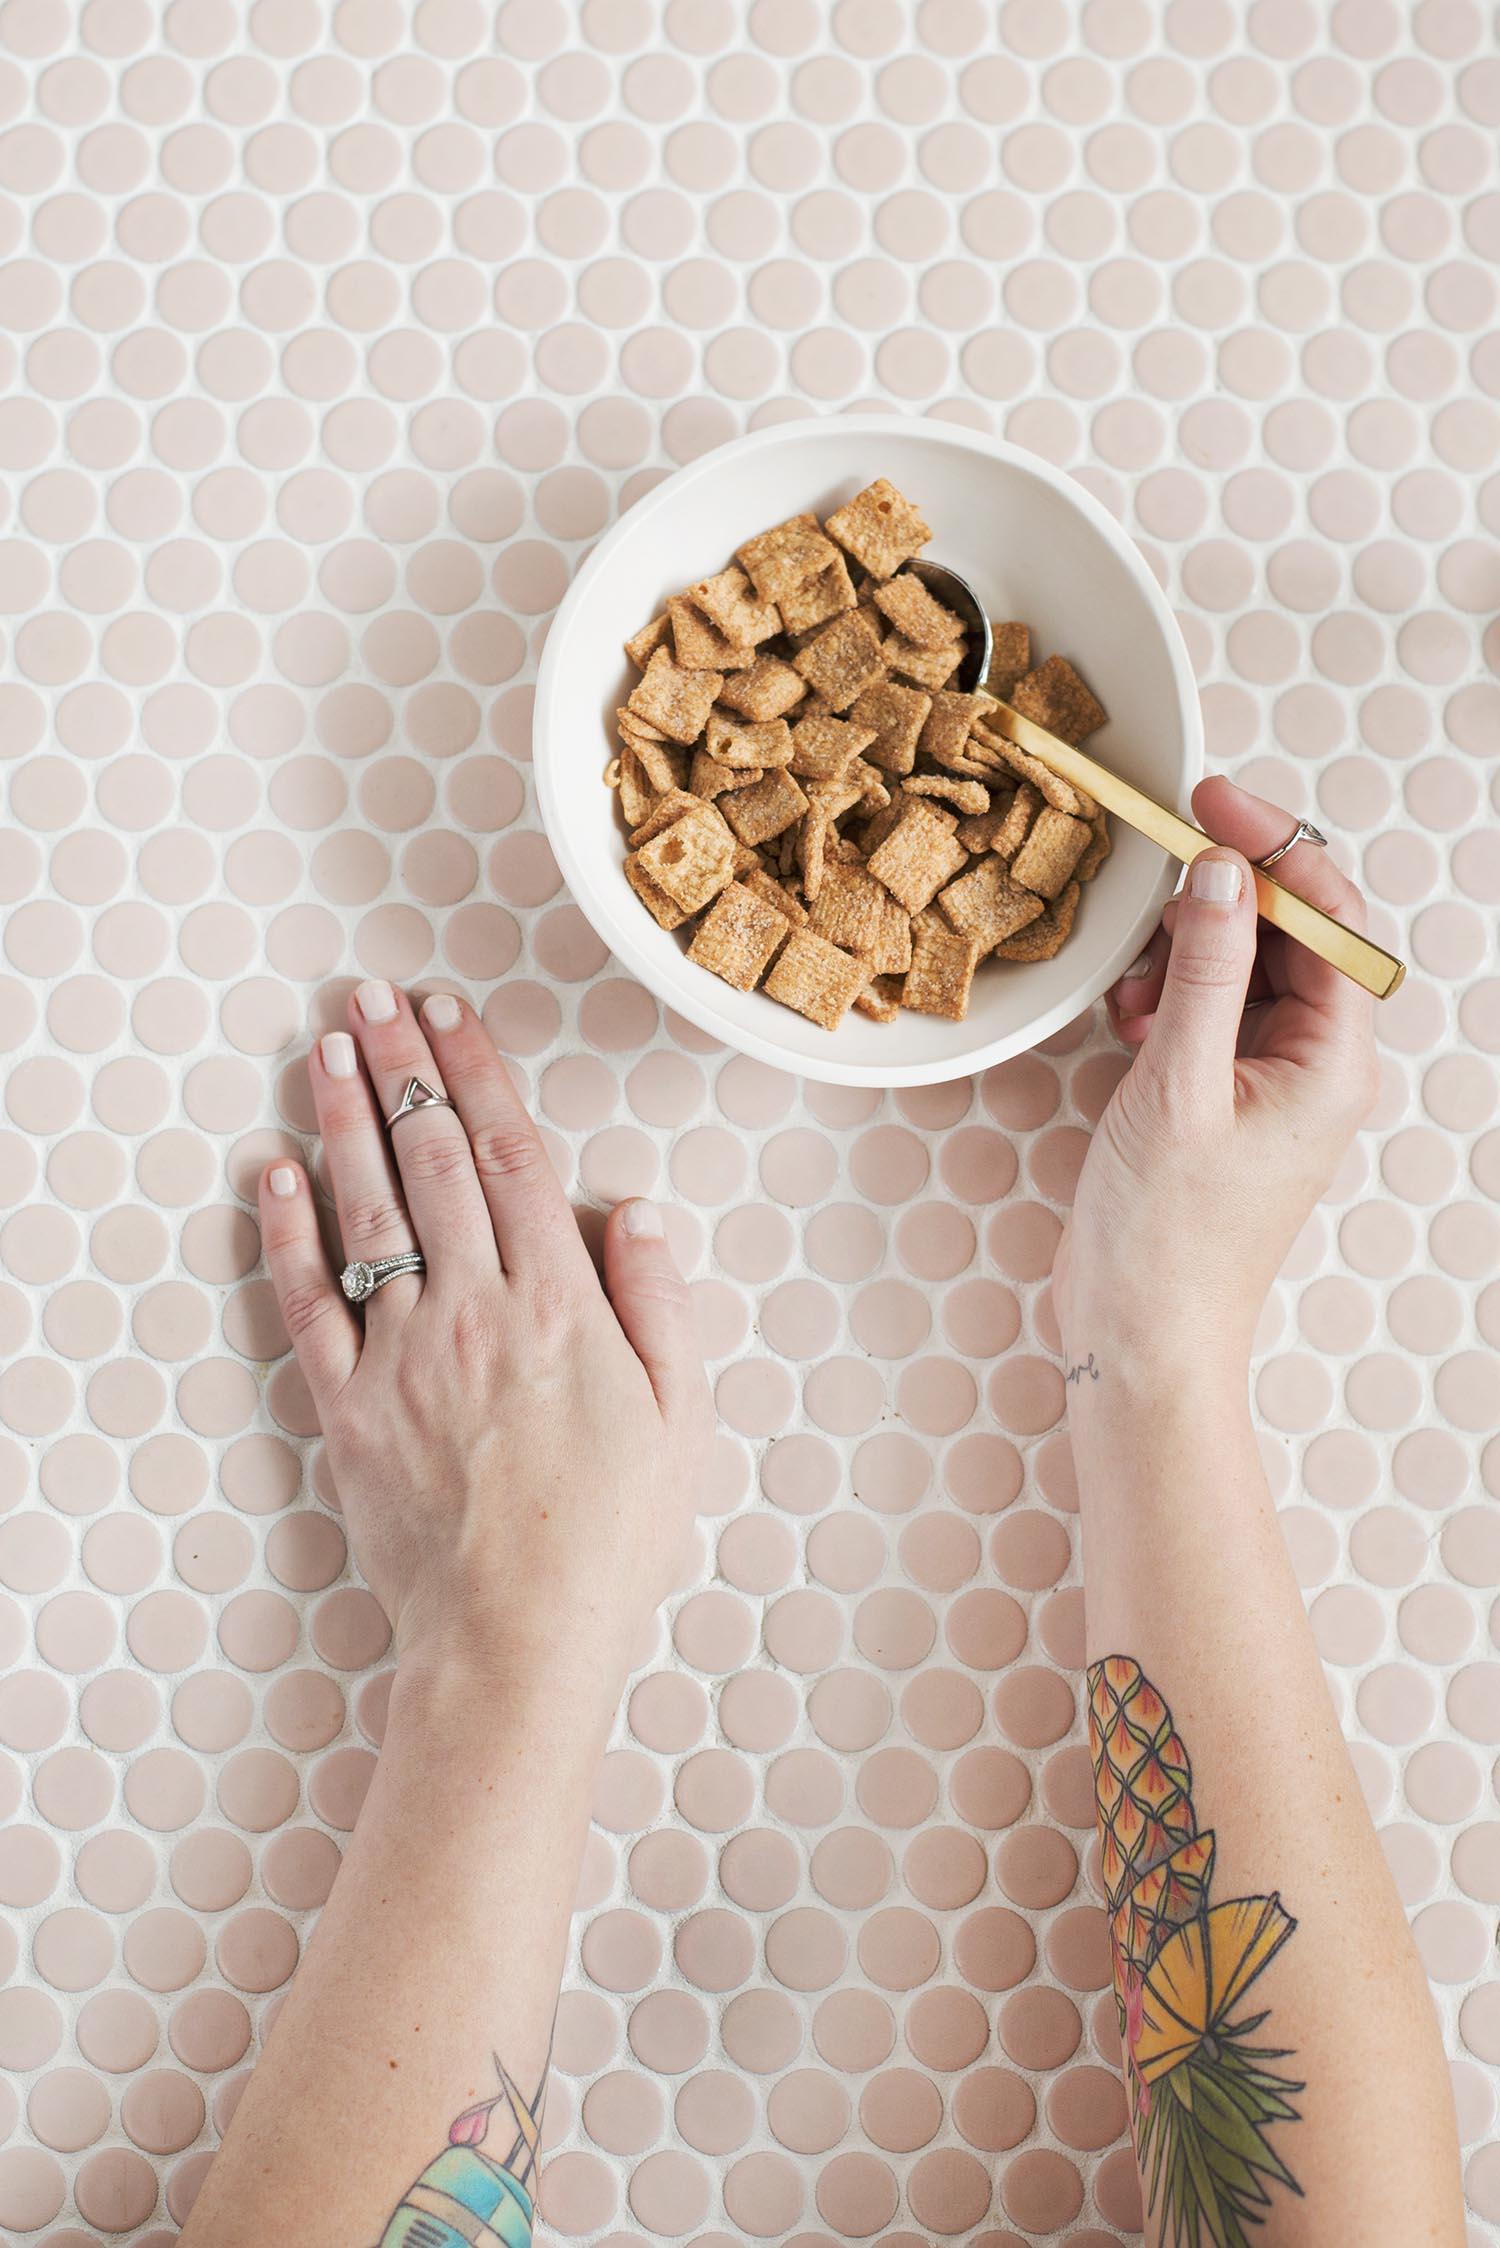 How I finally stopped biting my nails (via abeautifulmess.com)